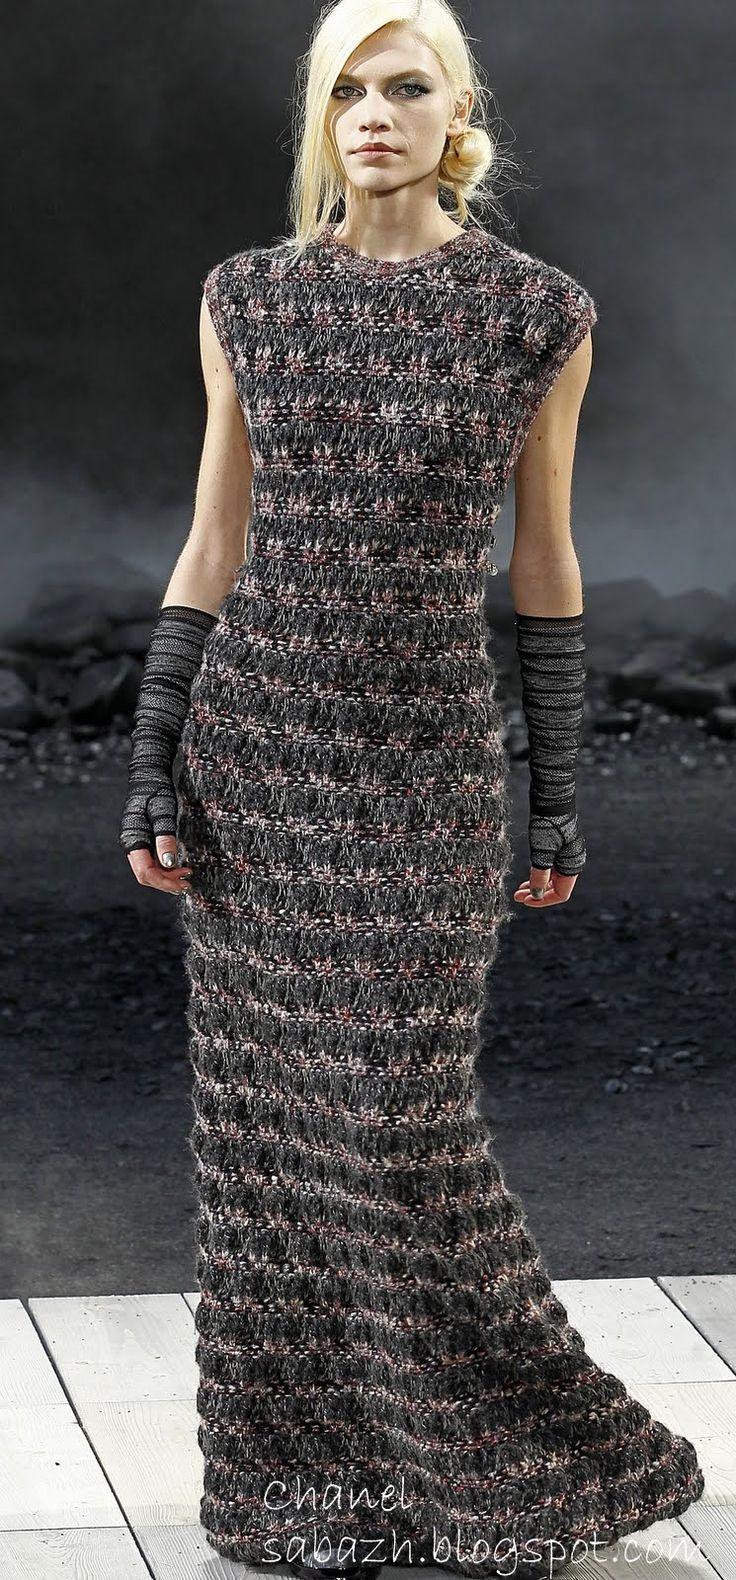 Сhanel ♪ ♪ ... #inspiration_crochet #diy GB